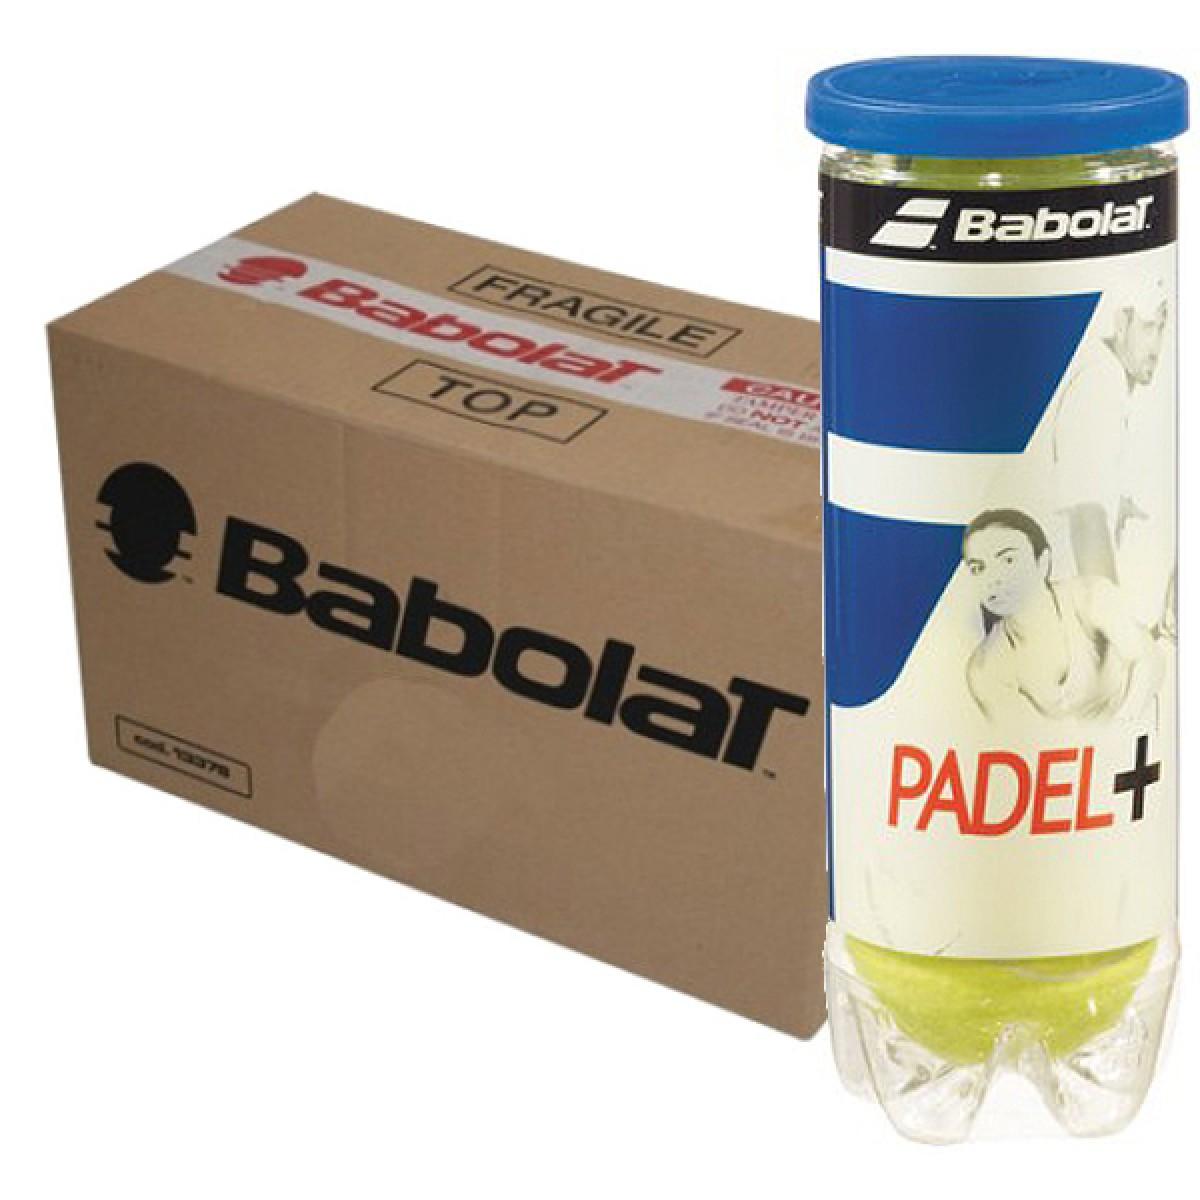 CARTON DE 24 TUBES DE 3 BALLES DE PADEL BABOLAT PADEL+